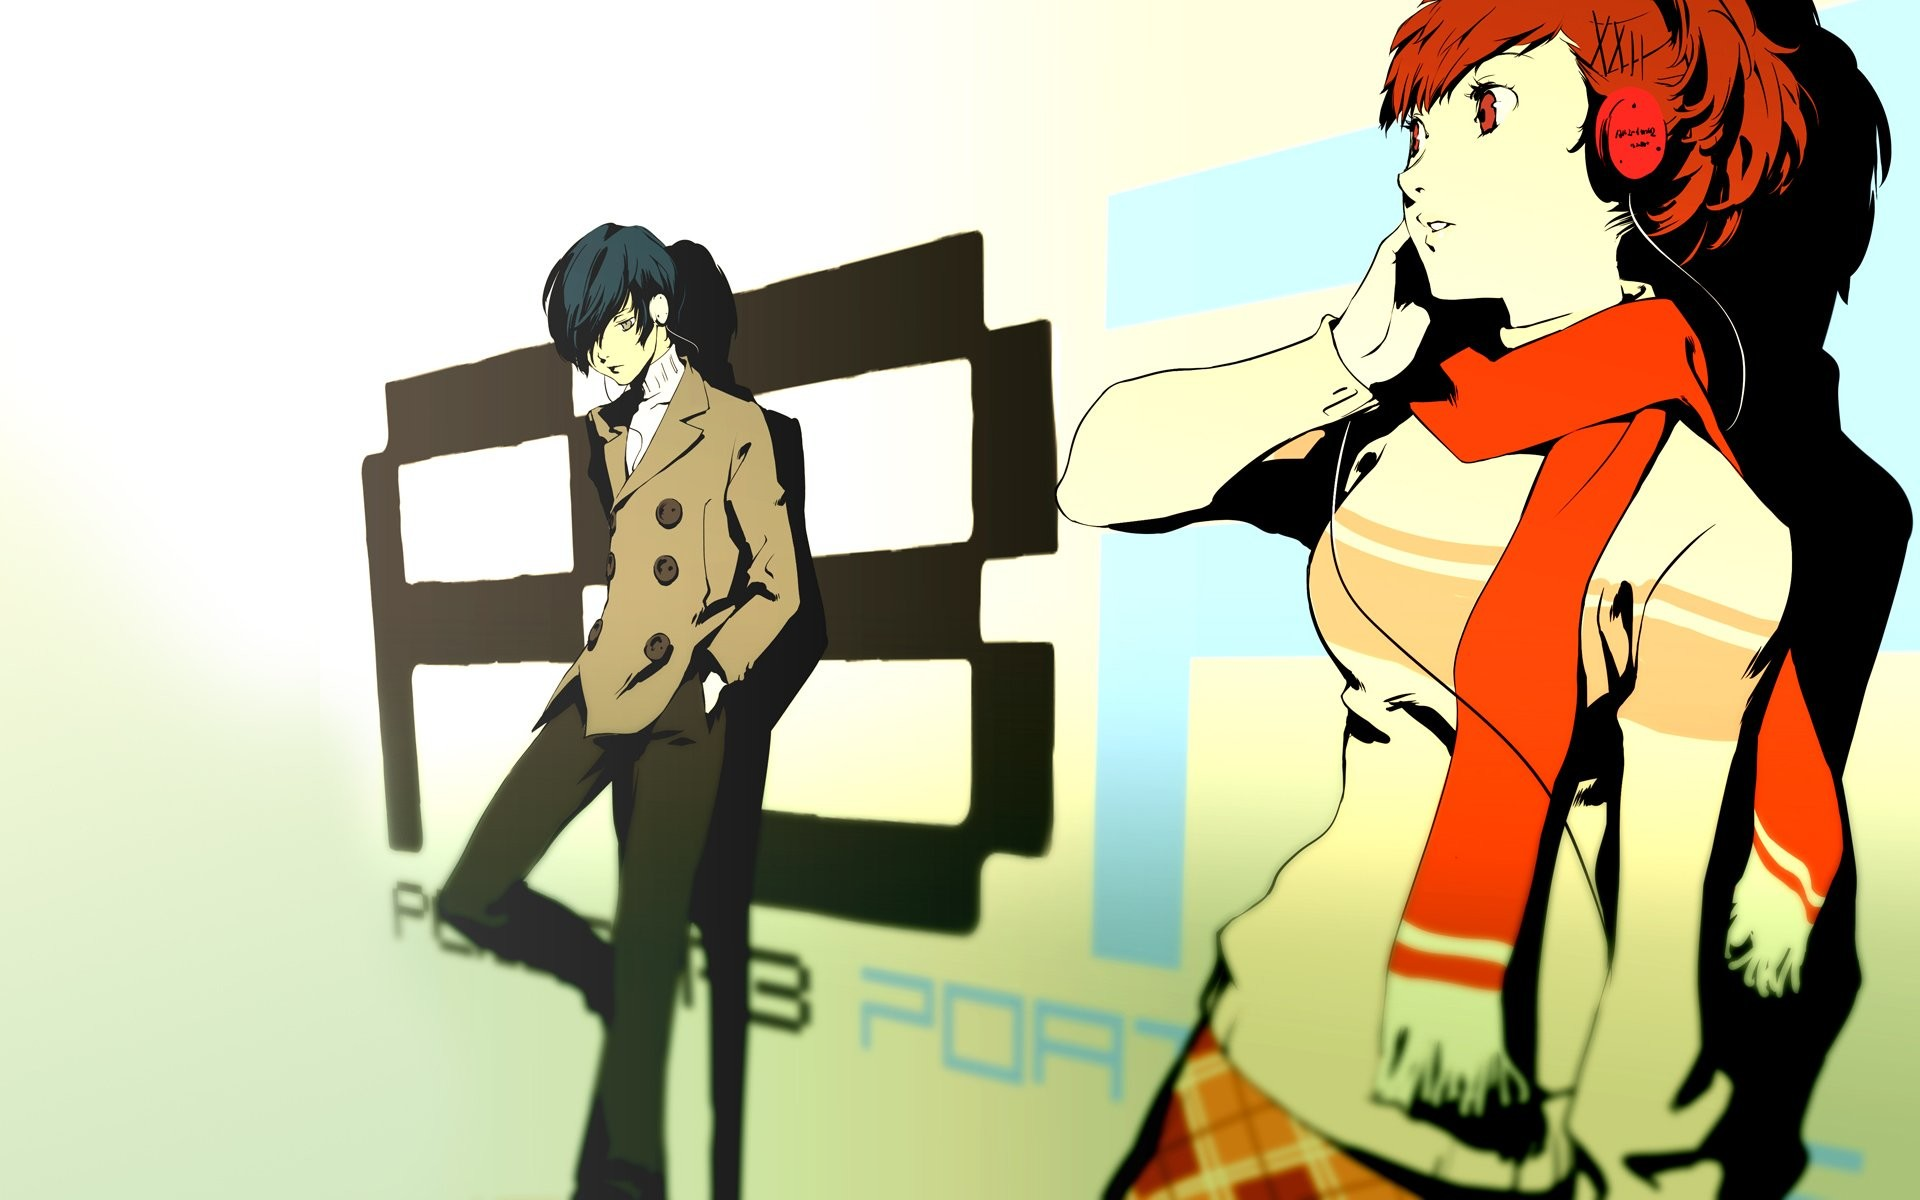 Persona 3: Minato Arisato and Thanatos by Sirioth on DeviantArt